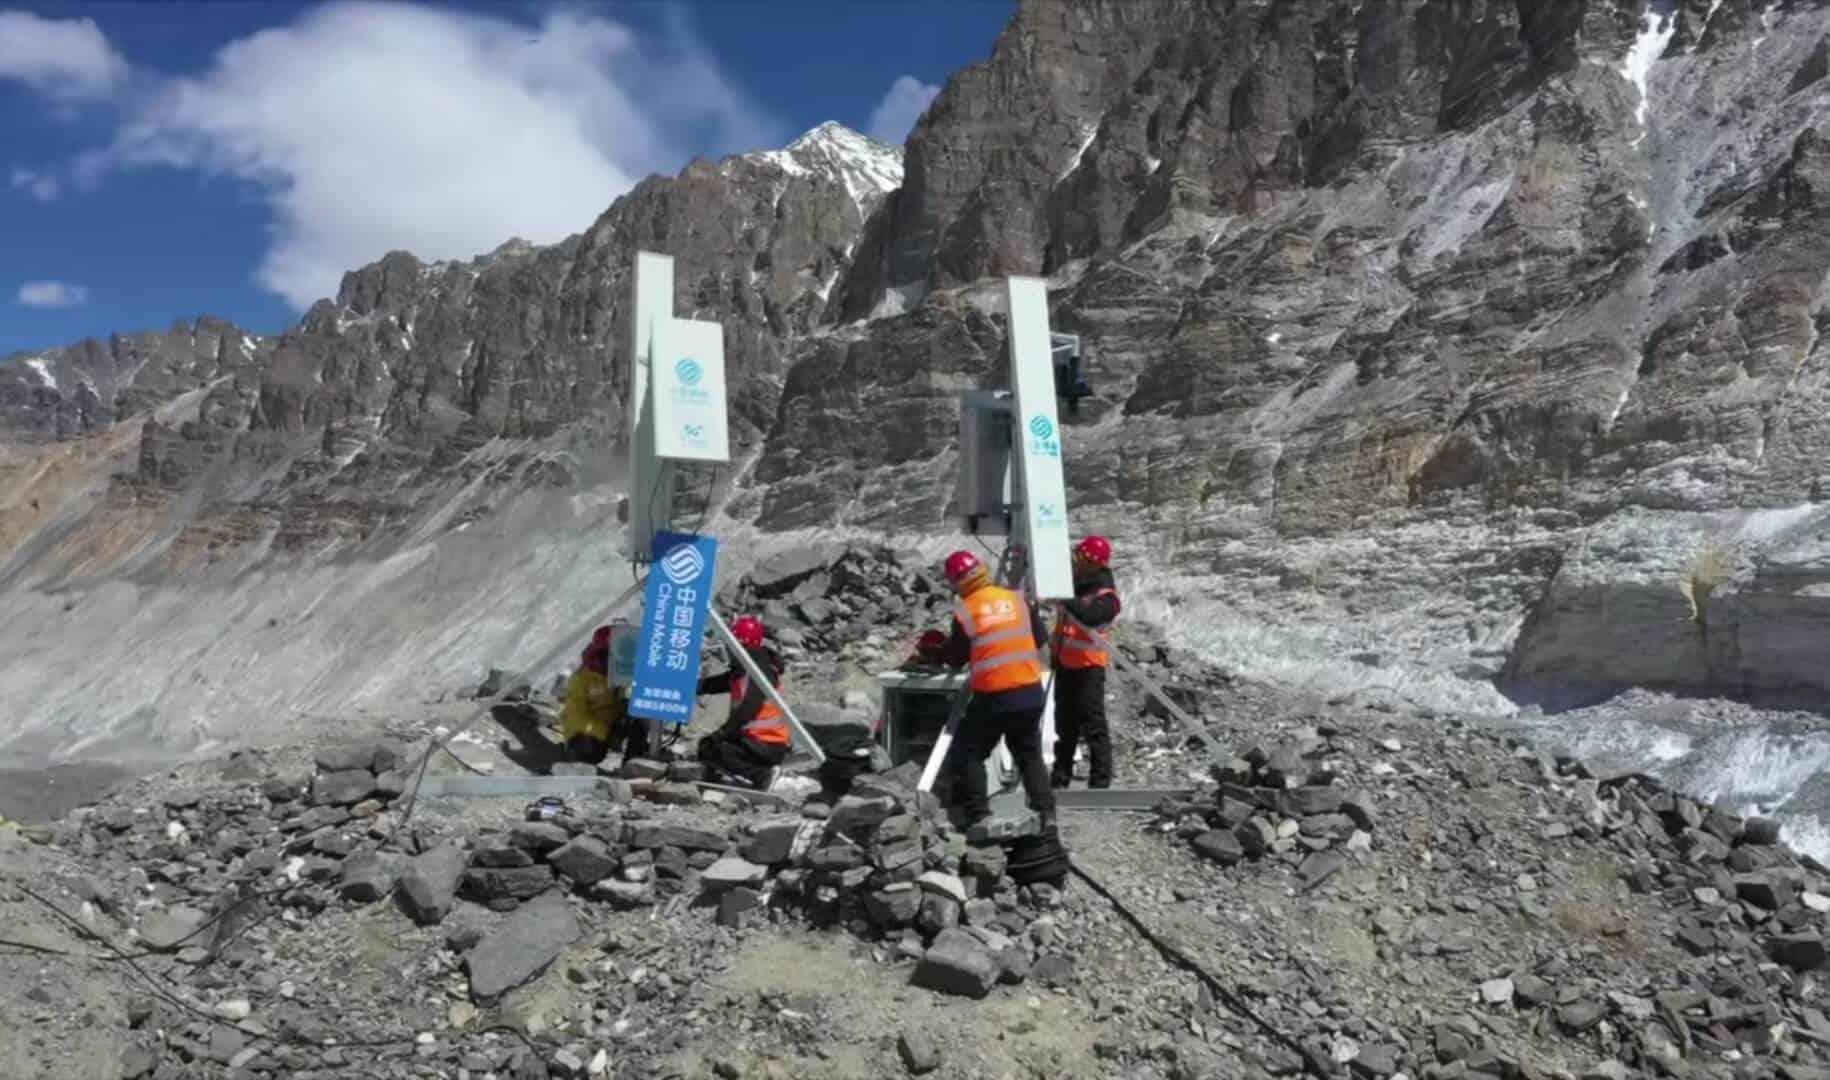 5G Mount Everest